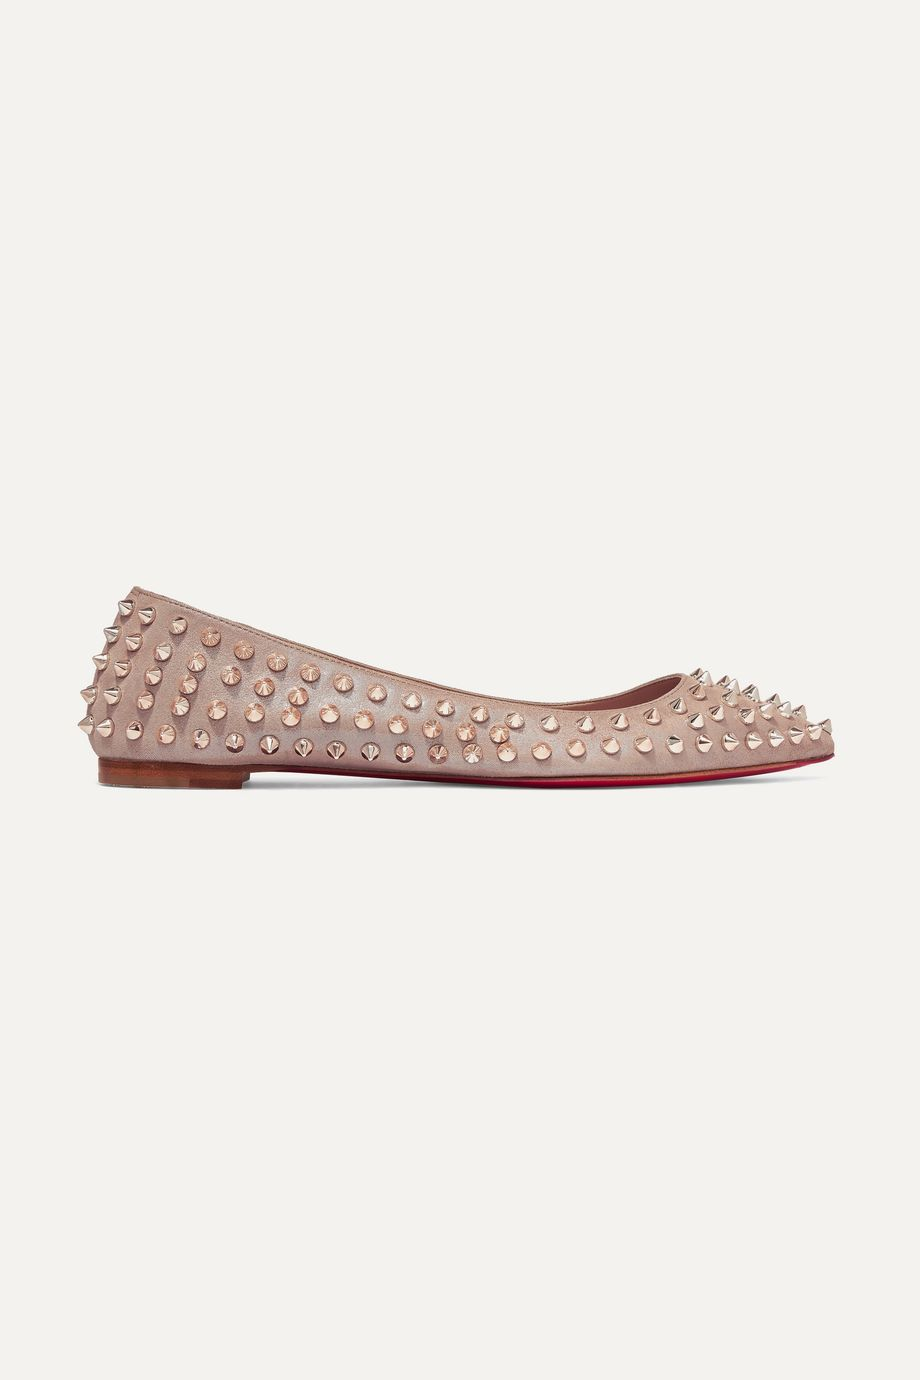 Christian Louboutin Ballalla spiked leather point-toe flats